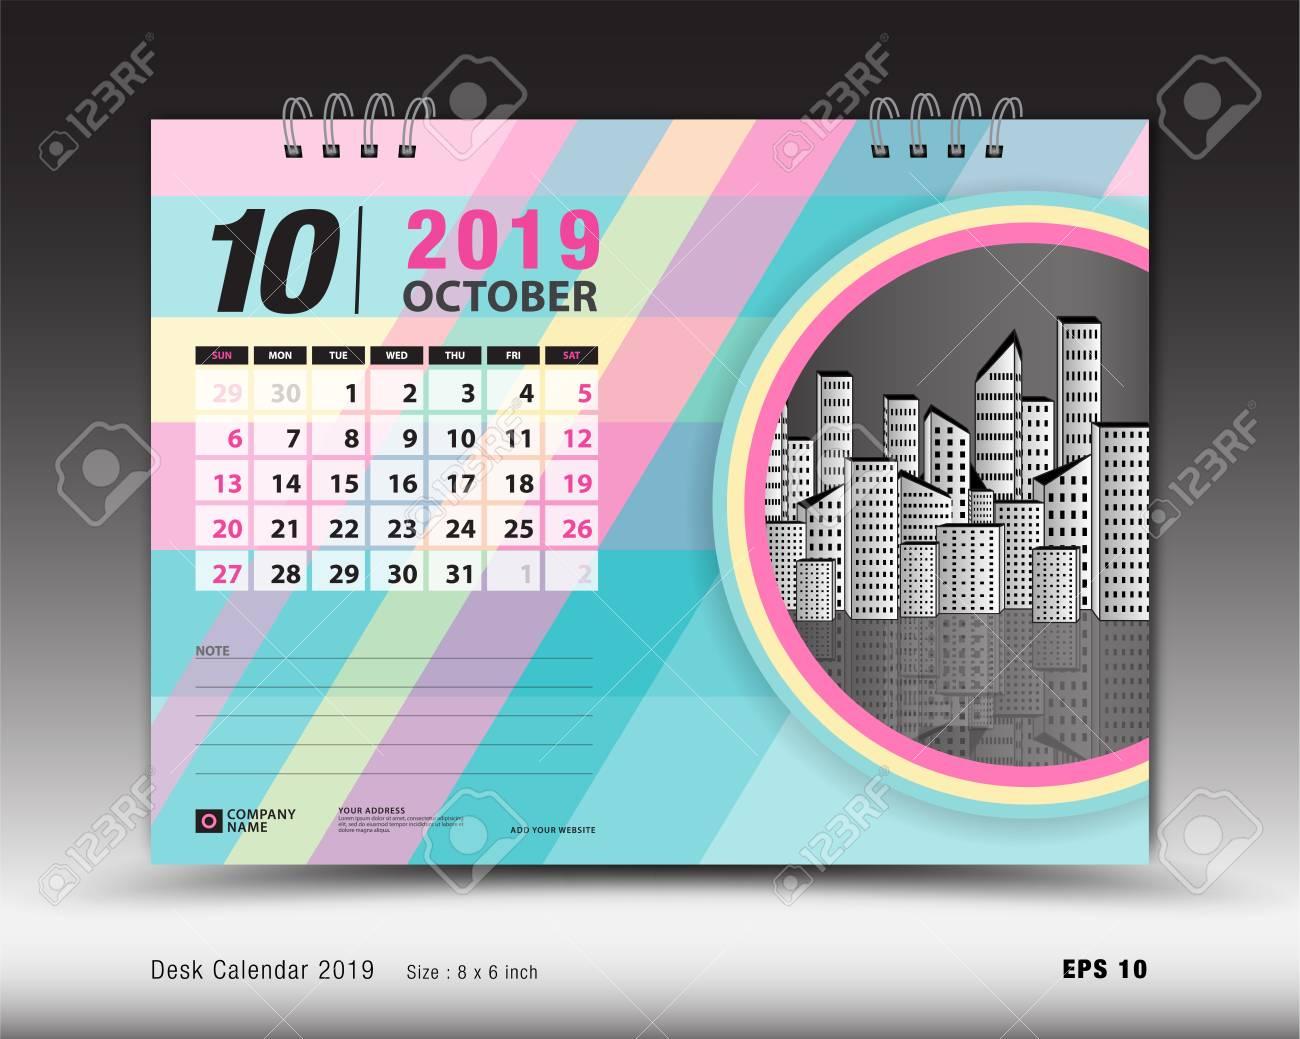 Desk Calendar For October 2019 Template Printable Calendar